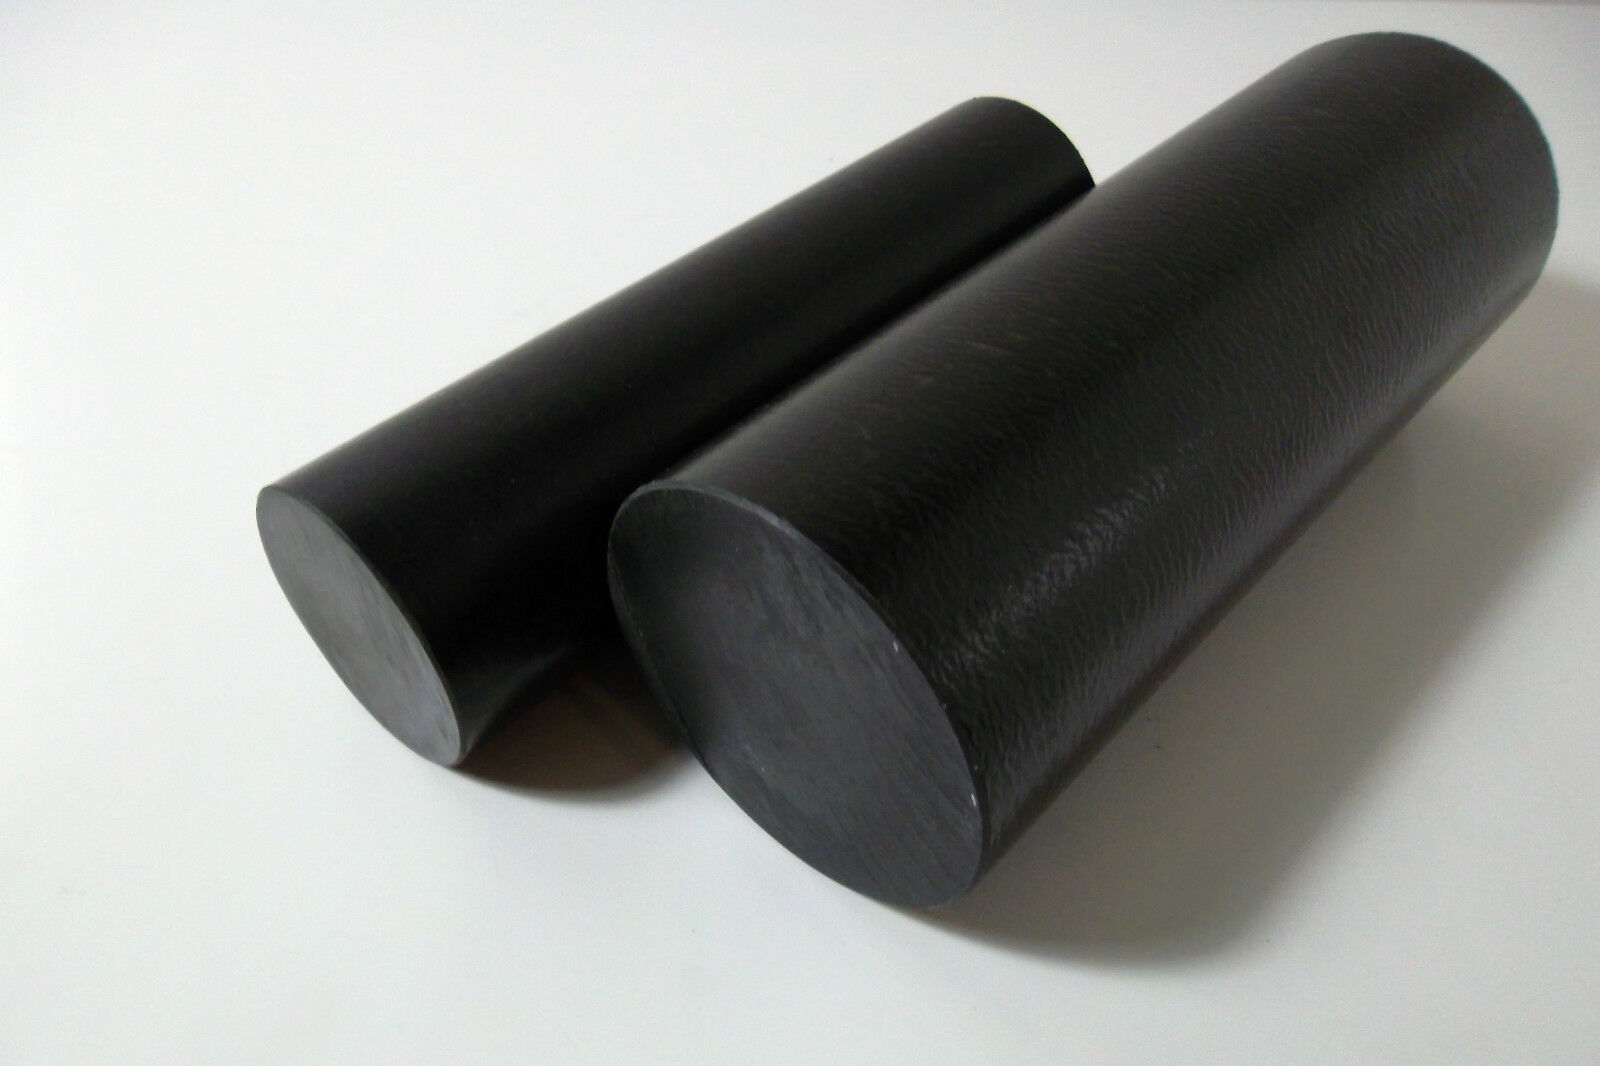 7018) PEEK 72mm ,etheretherketone,negro, Ø 52mm y Ø 72mm PEEK 277b15